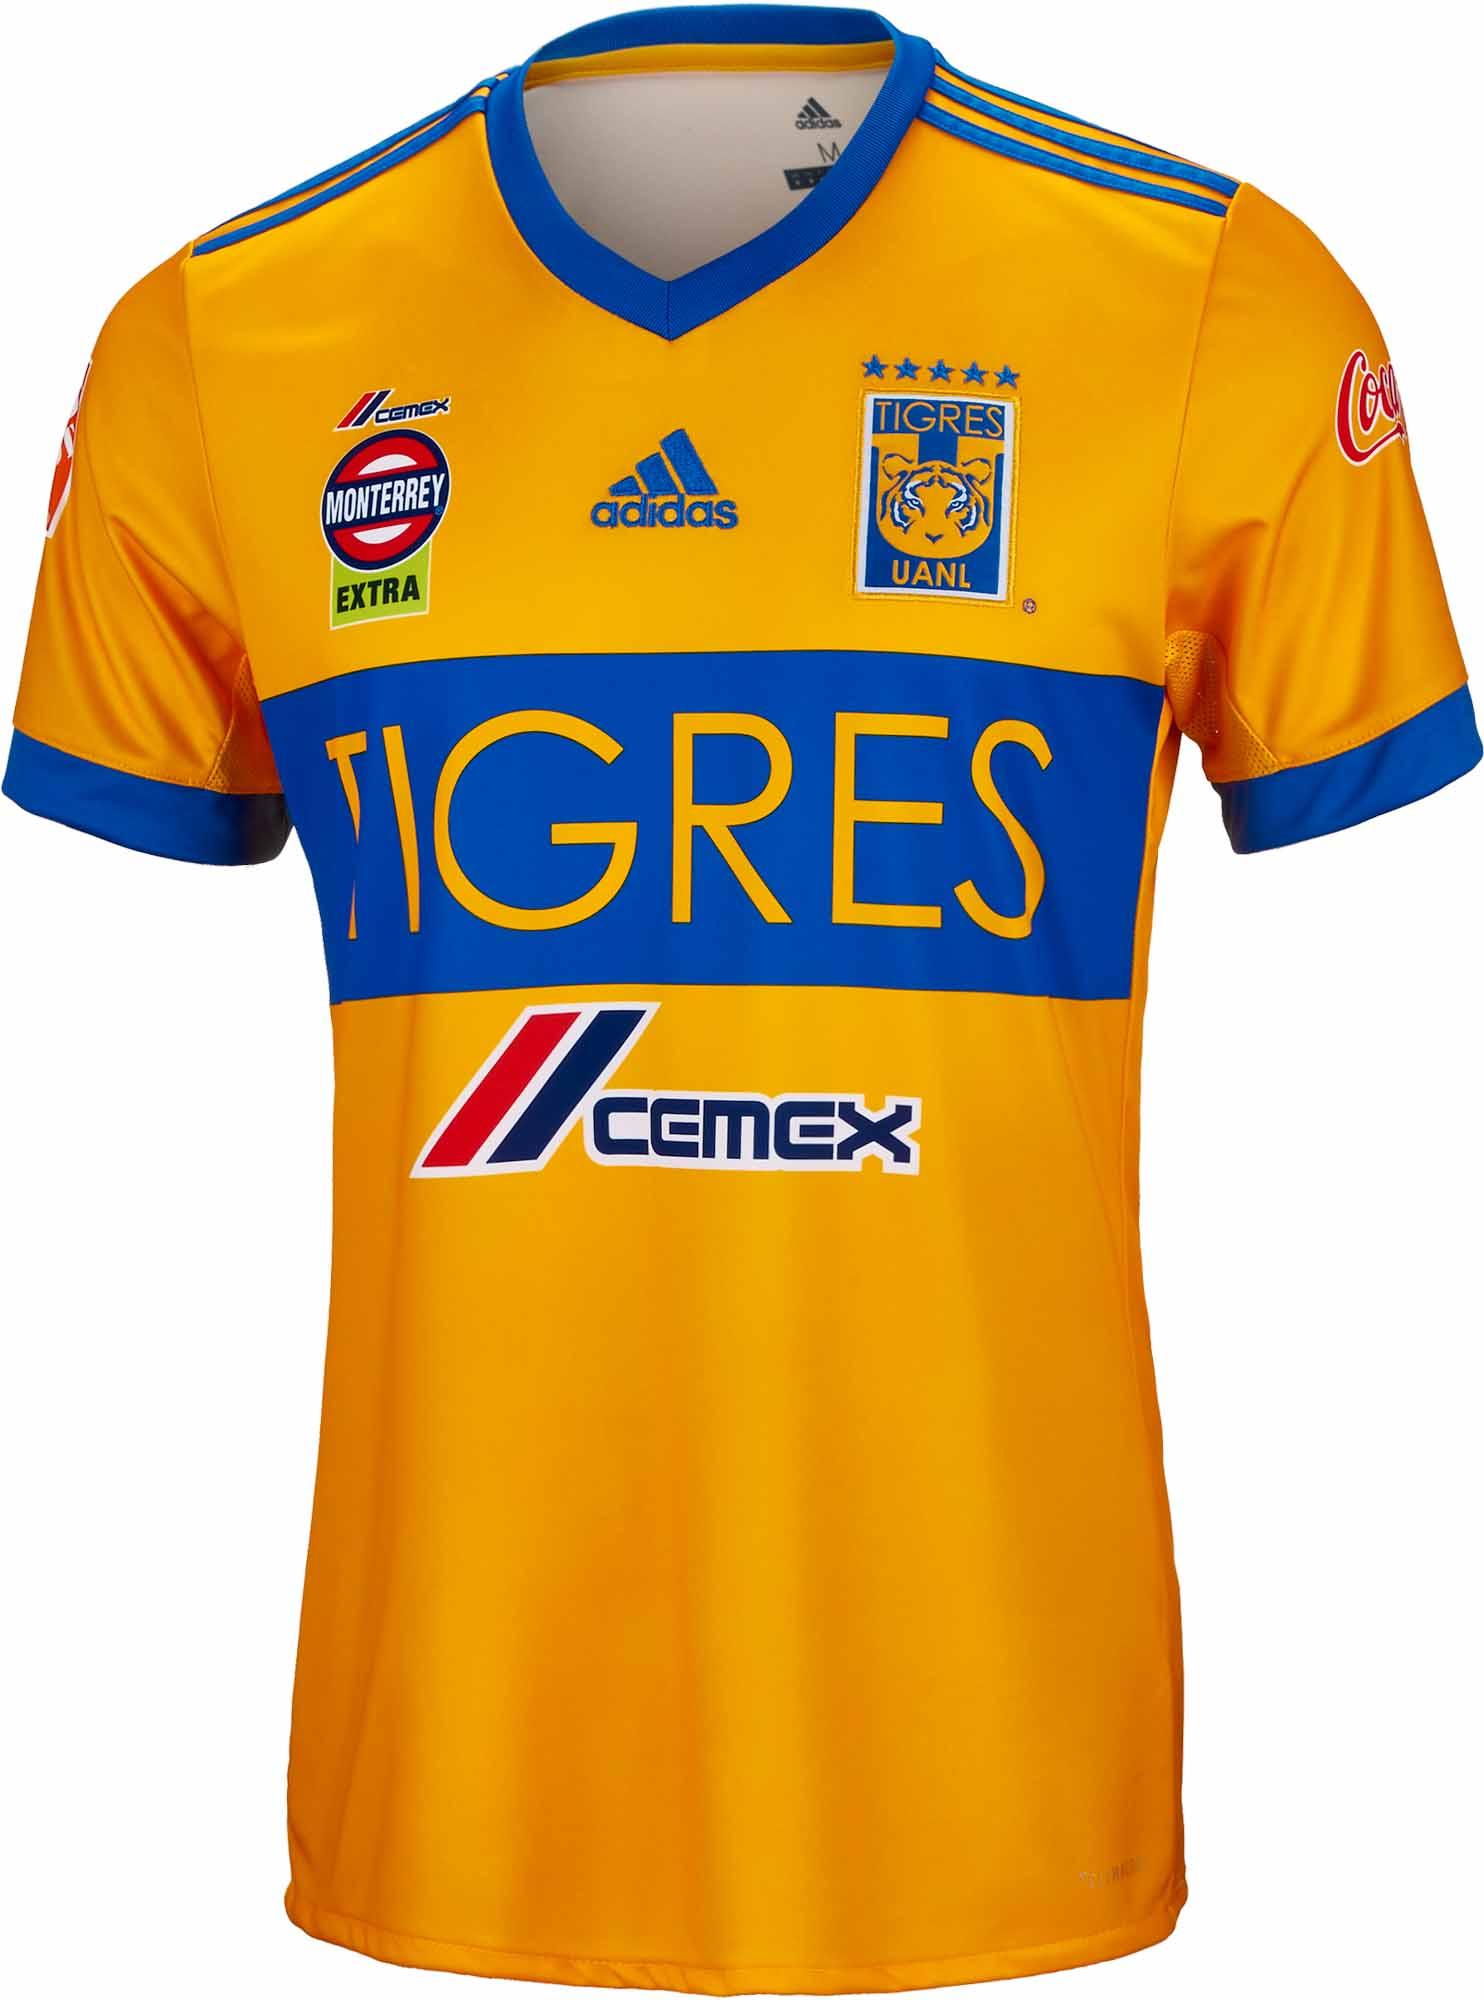 2017/18 adidas Tigres Home Jersey- Tigres Soccer Jersey